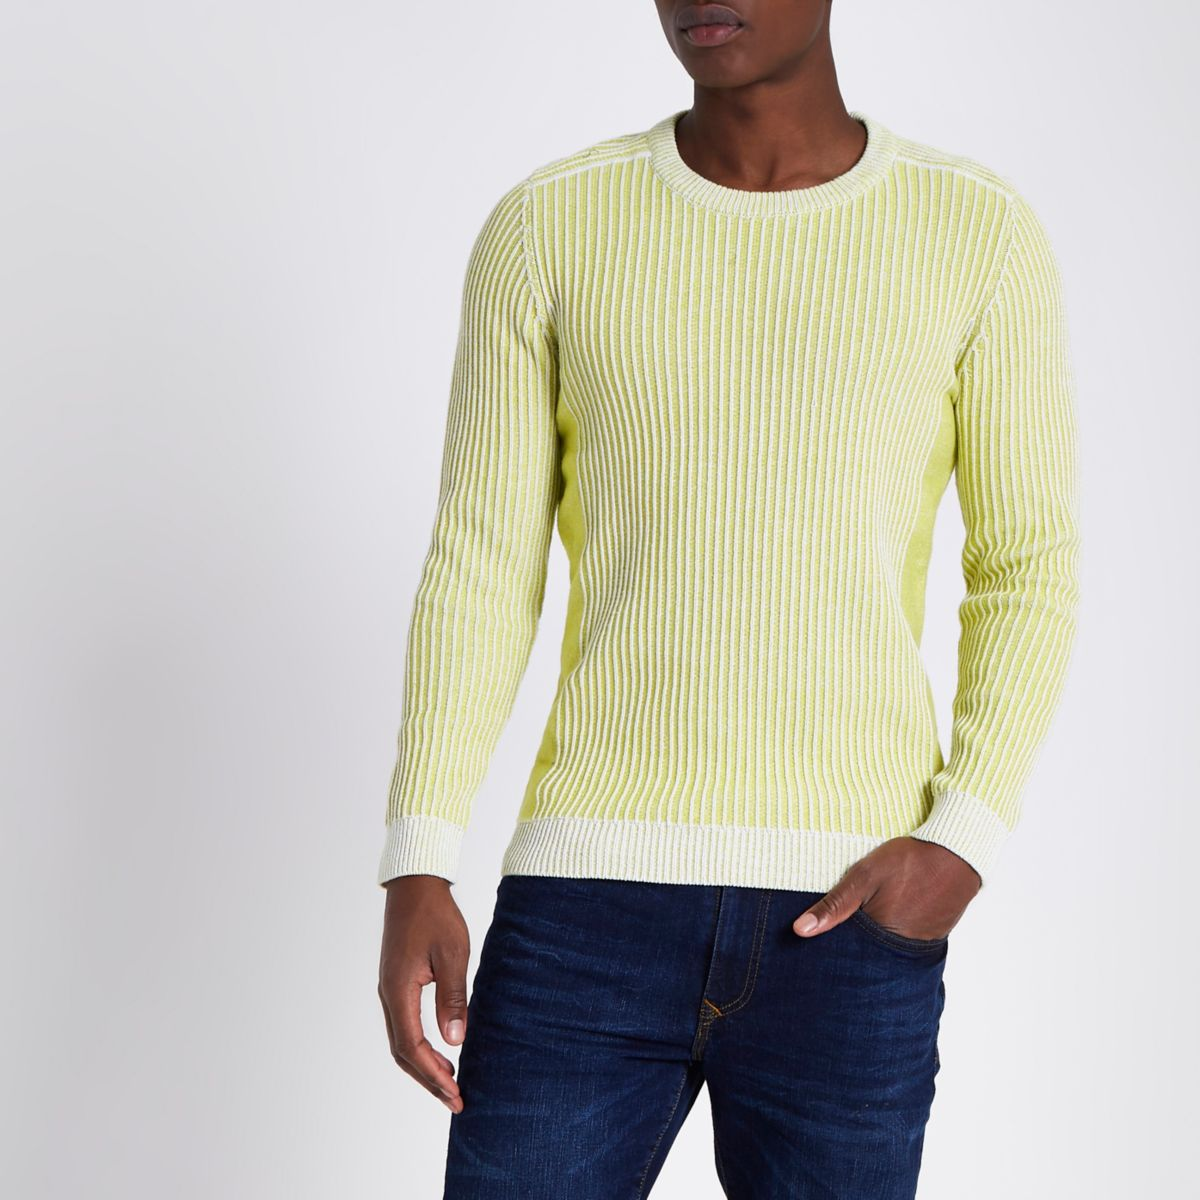 Yellow rib knit muscle fit sweater